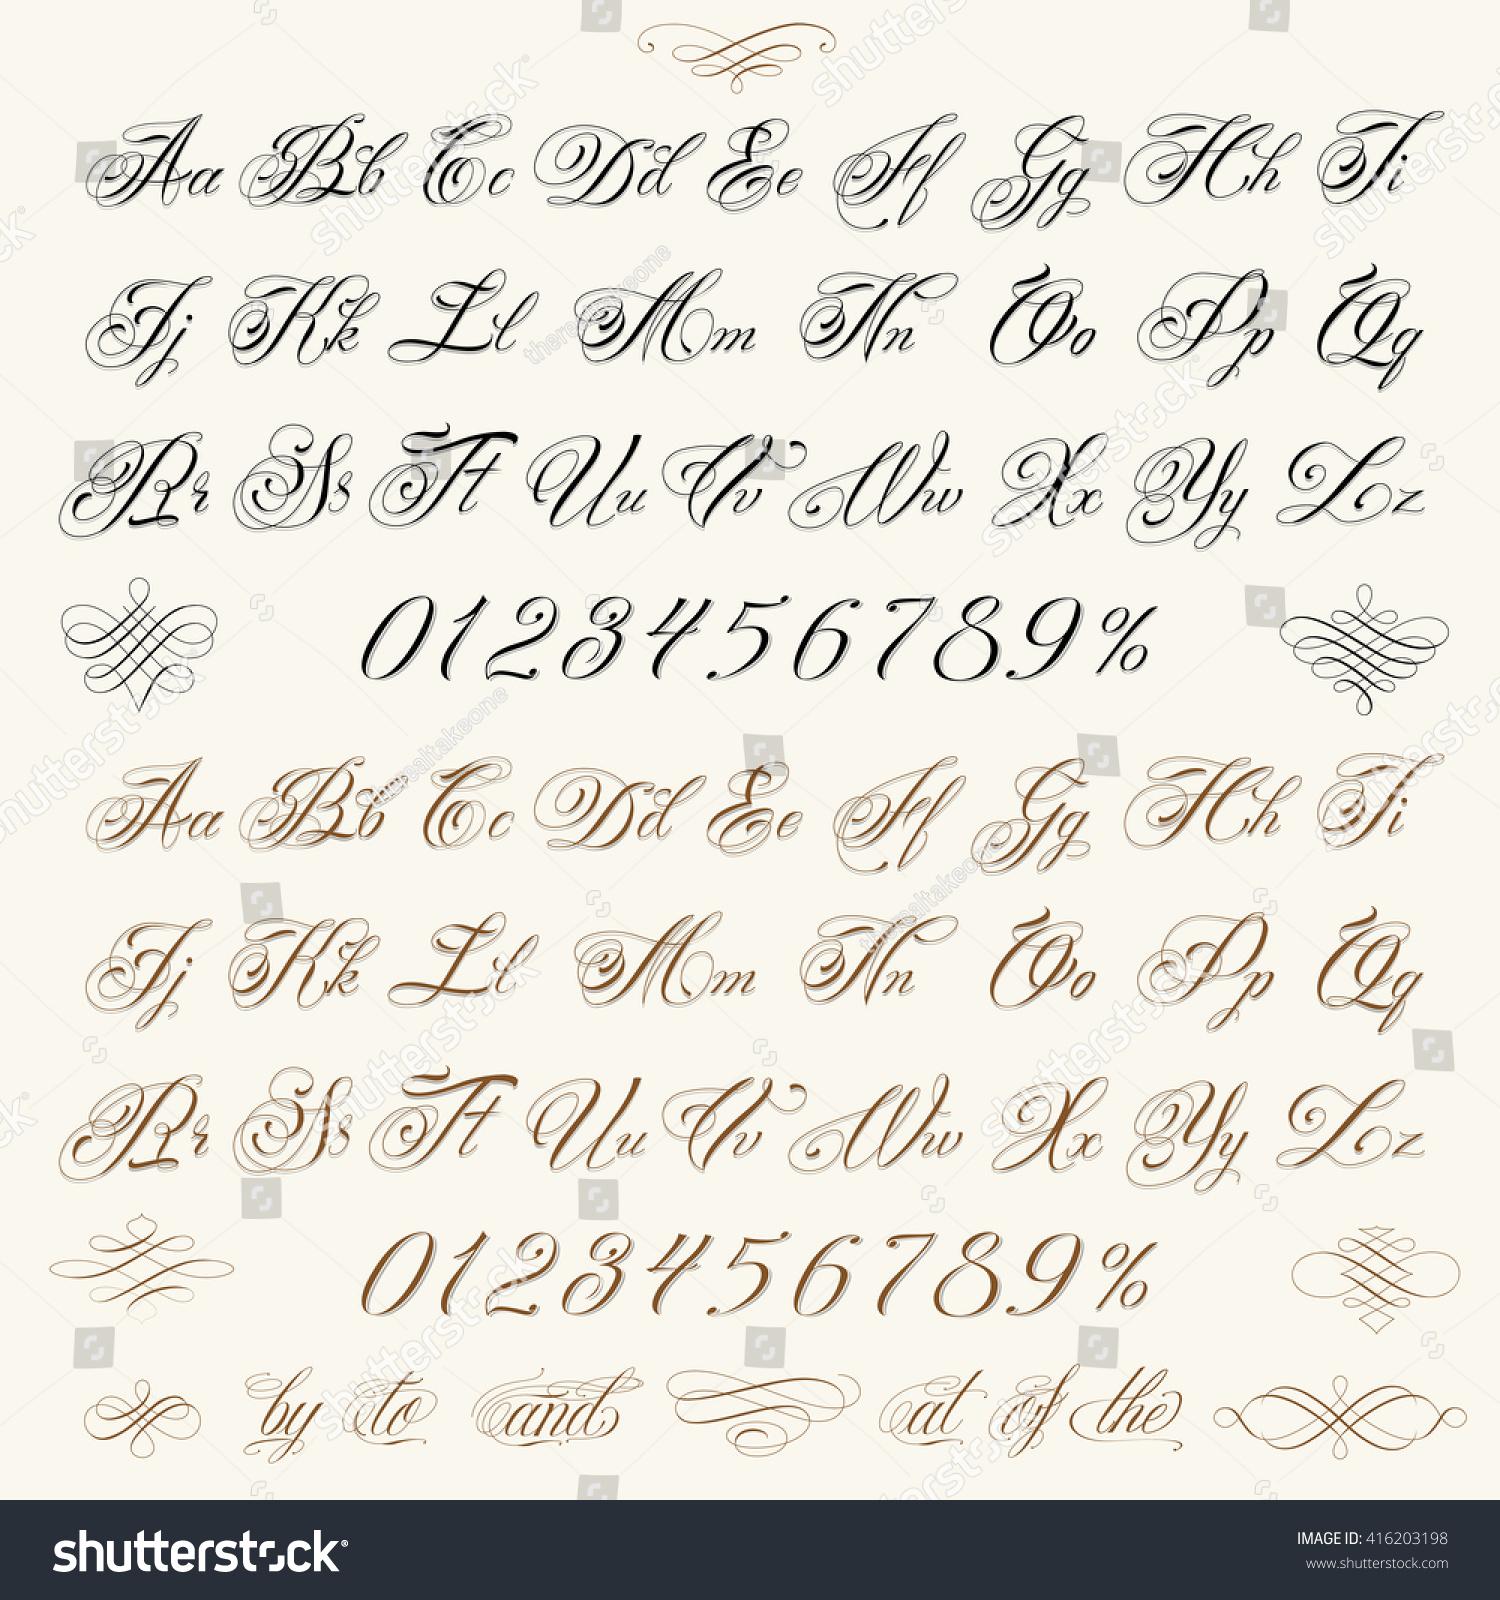 Handmade vector calligraphy tattoo alphabet numbers stock